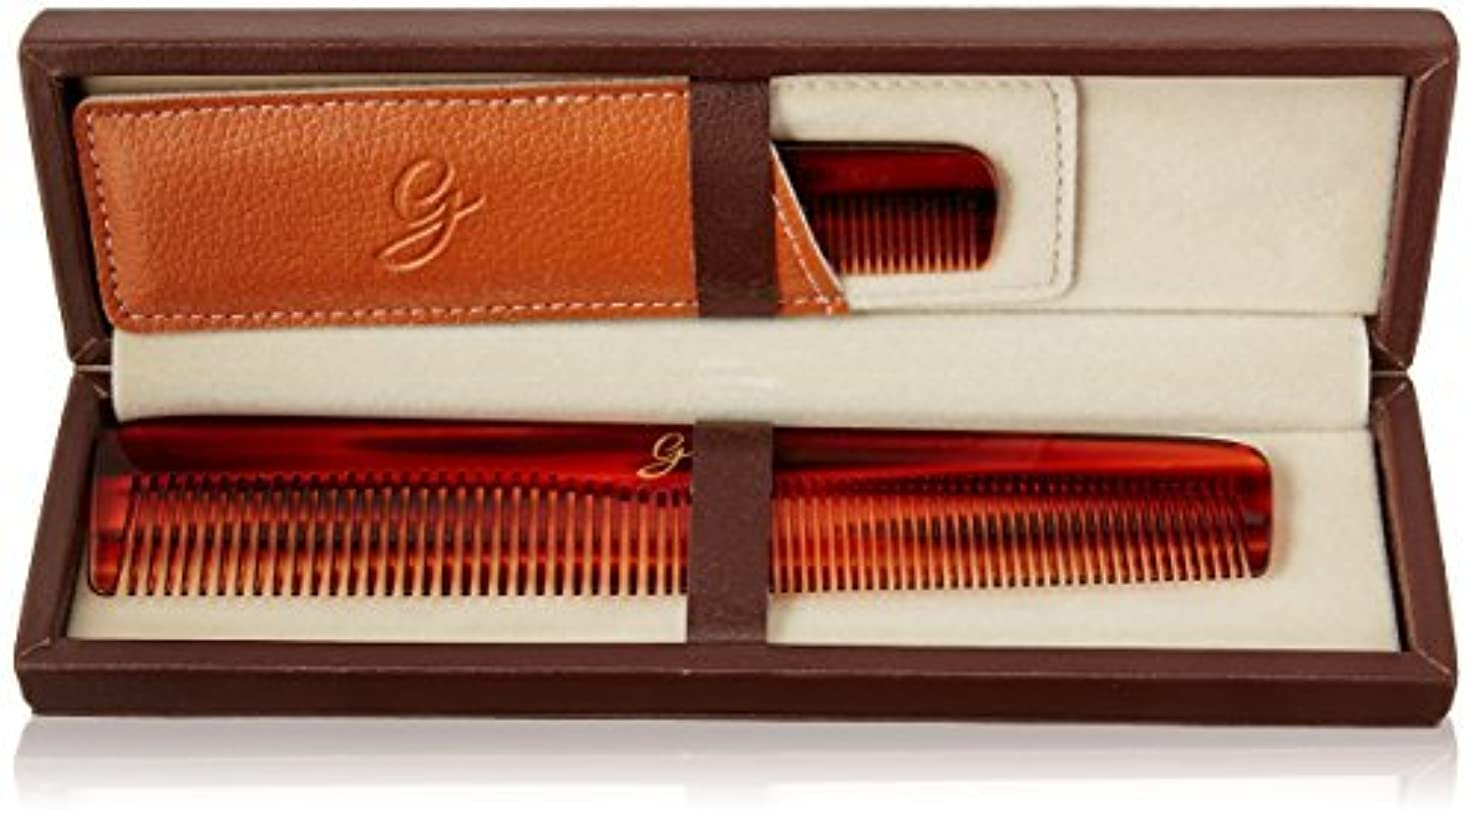 Creative Hair Brushes The Perfect Gentleman Comb [並行輸入品]